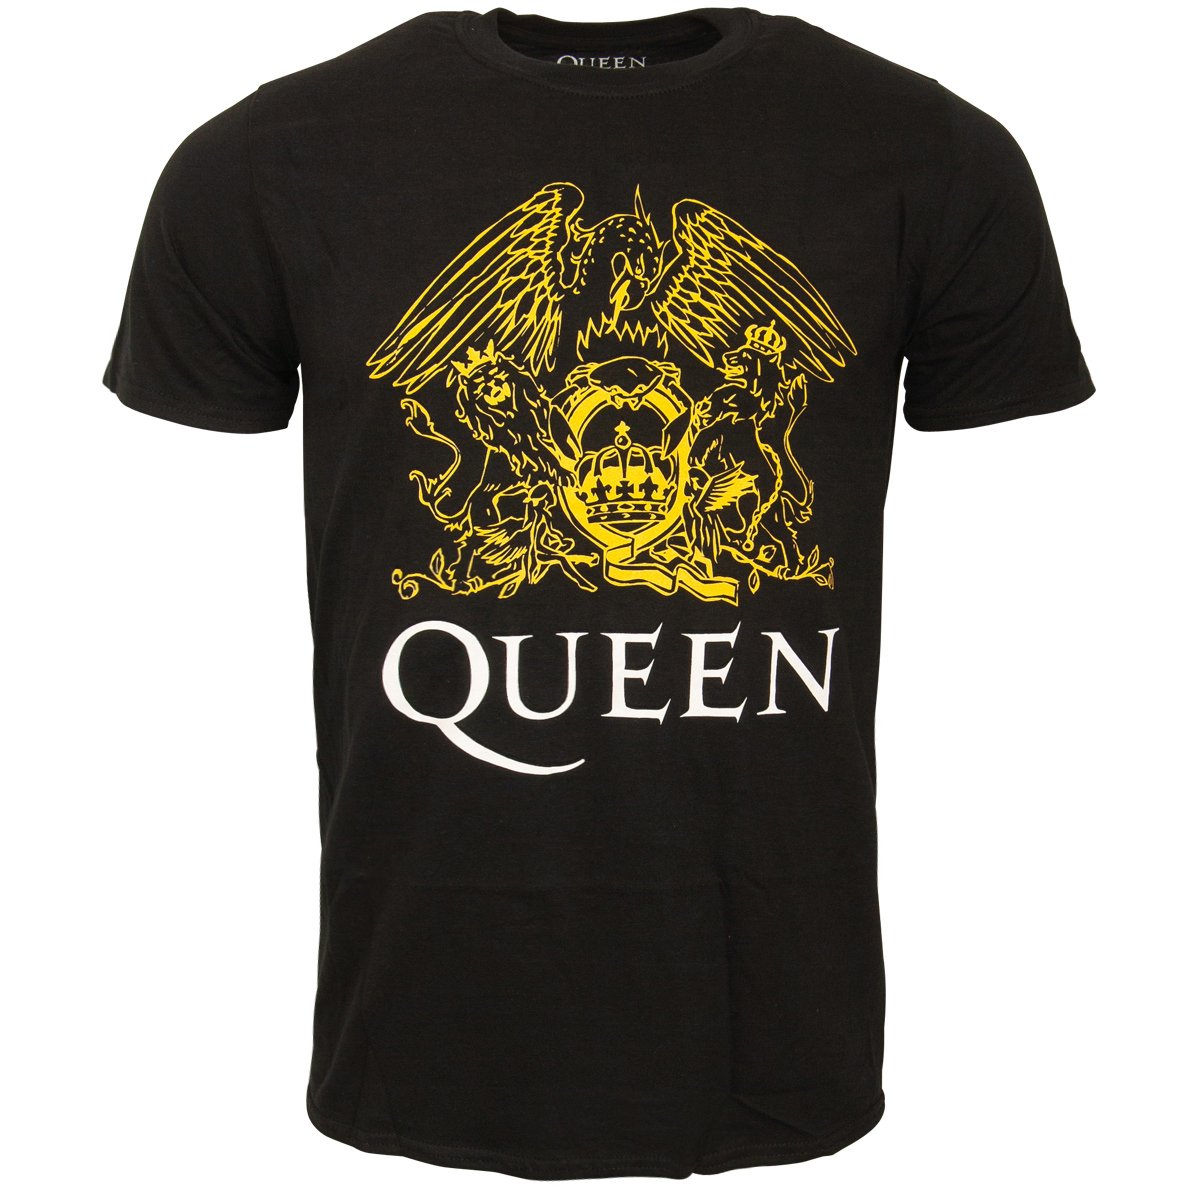 Queen - T-Shirt Crest - schwarz